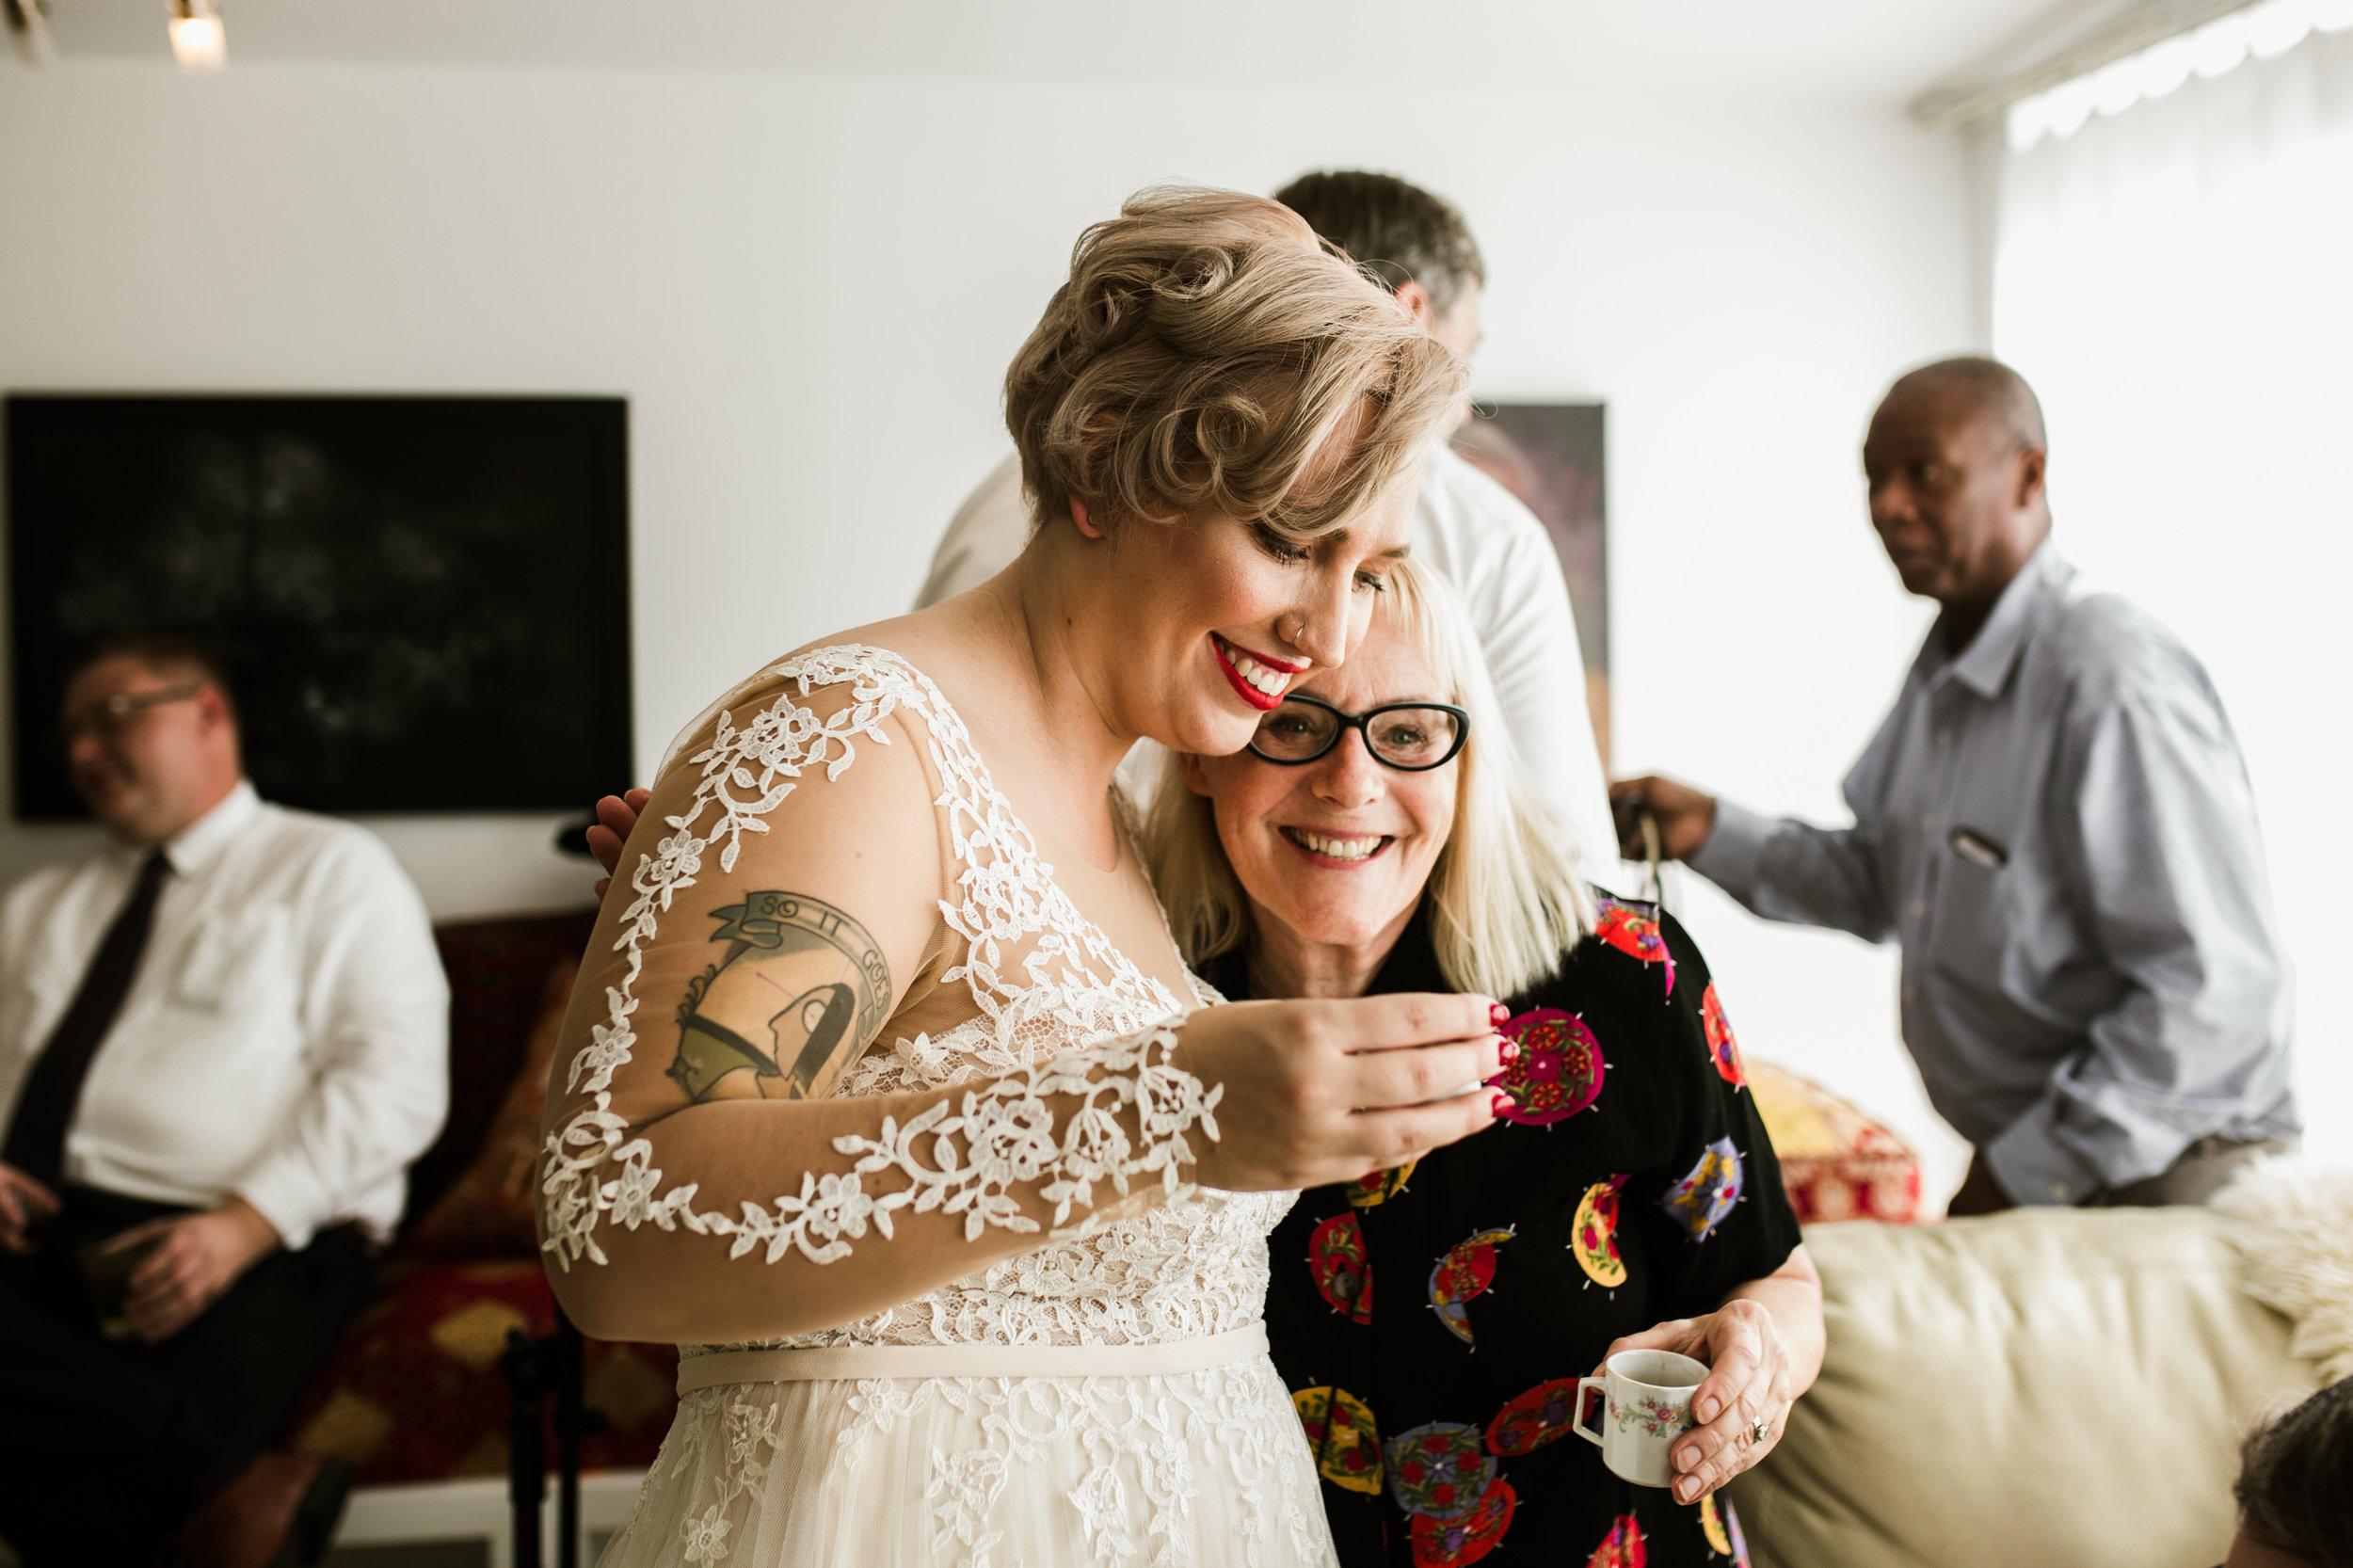 Kentucky Wedding Louisville Wedding Photographer 2018 Crystal Ludwick Photo Louisville Wedding Photographer Kentucky Wedding Photographer (71 of 105).jpg